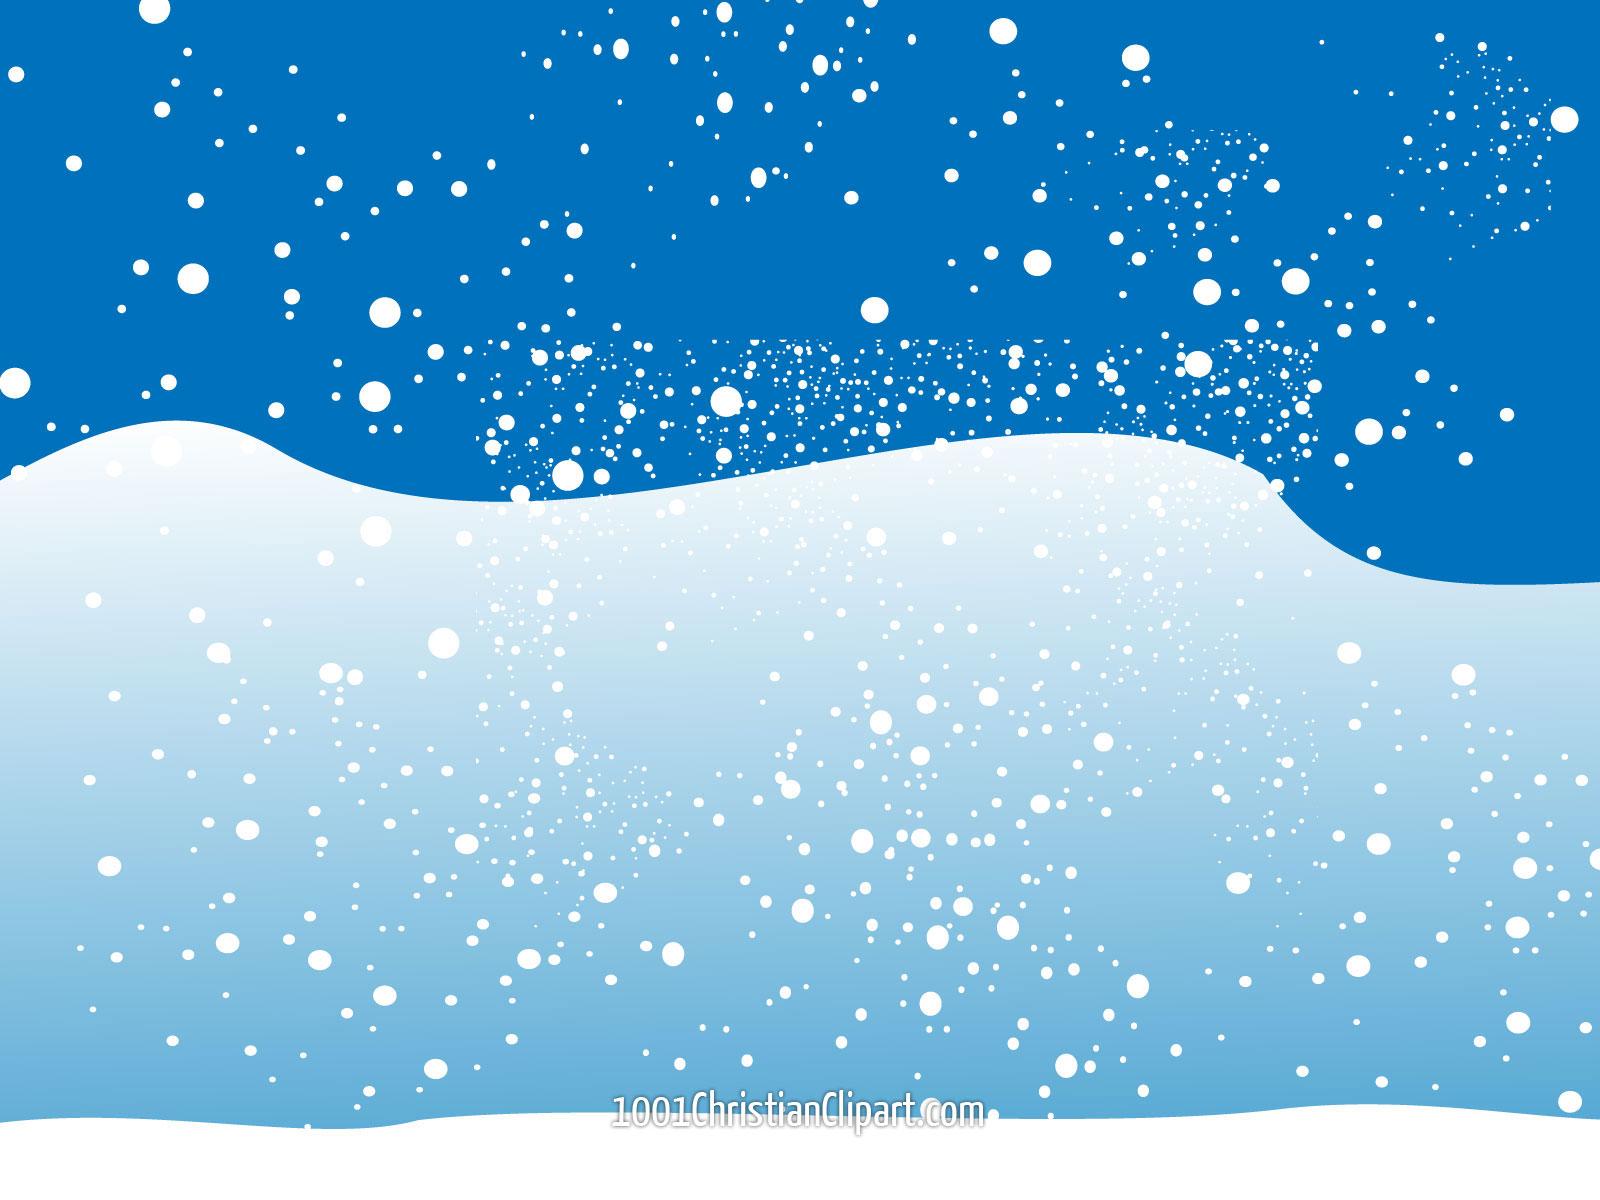 Christmas Snow Free Clipart Free Clip Ar-Christmas Snow Free Clipart Free Clip Art Images-8